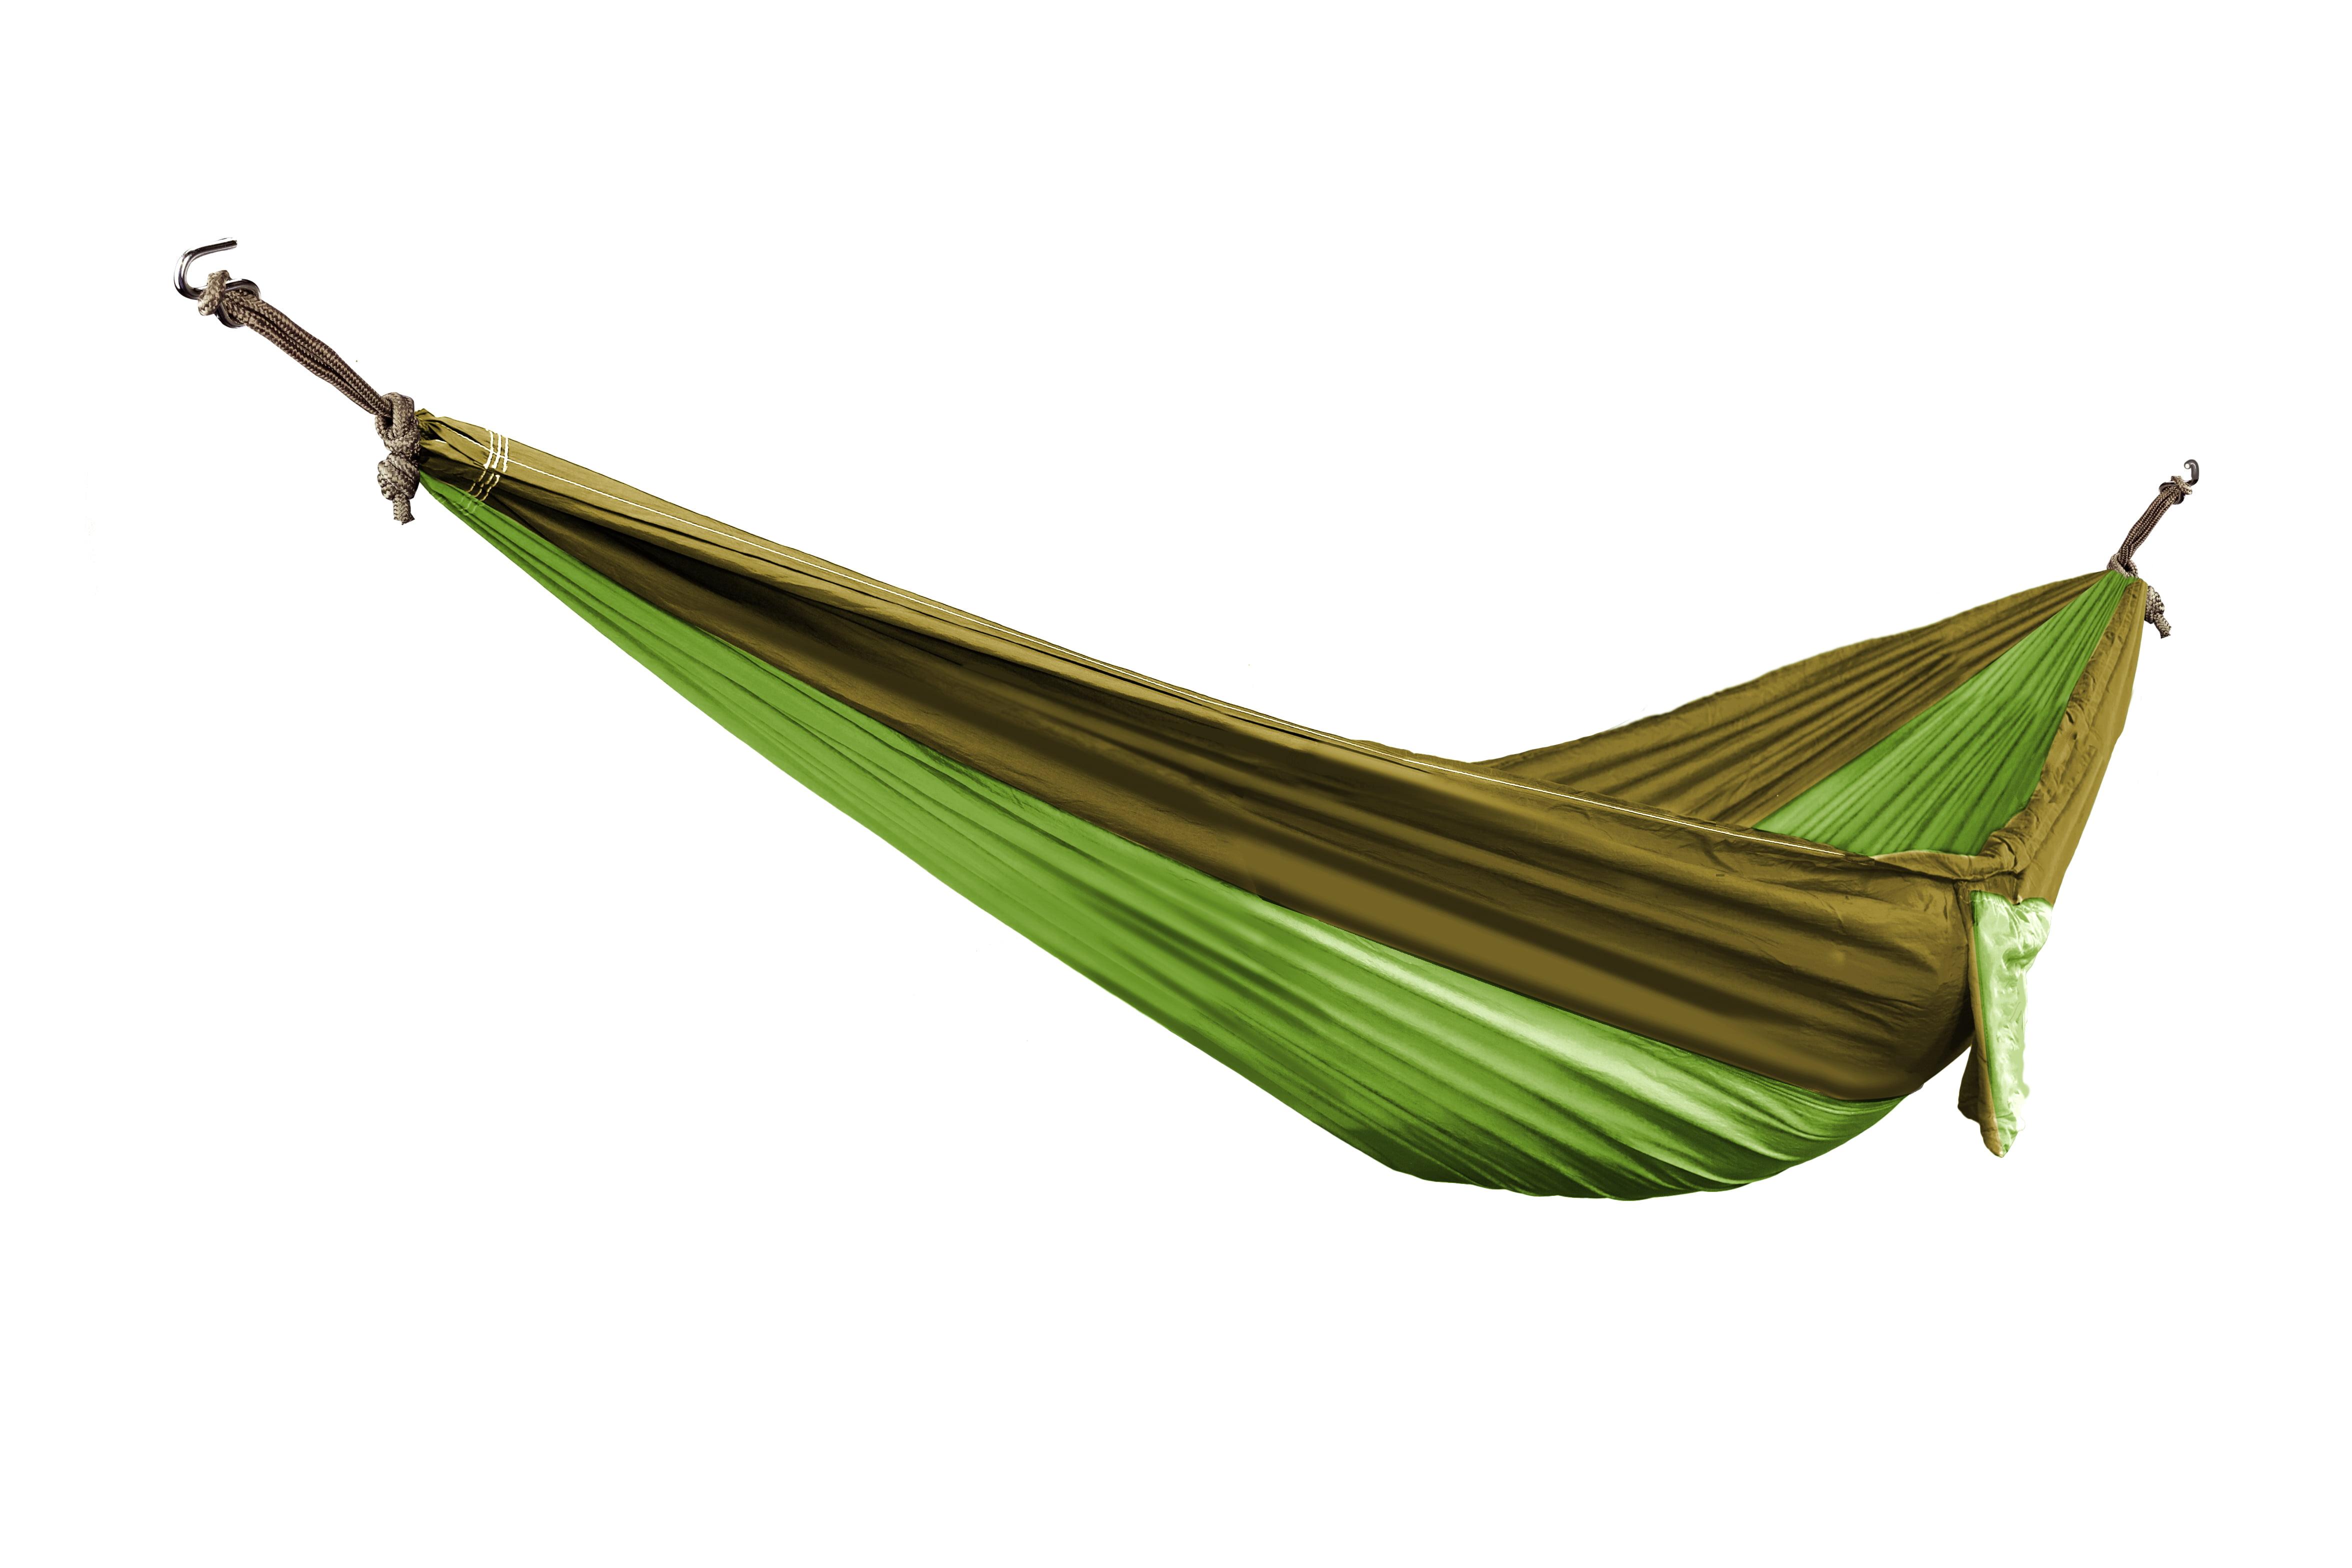 Bliss Hammocks Pocket Hammock for Outdoor, Hiking, Camping, Backpacking, Travel, Backyard, Beach by Bliss Hammocks Inc